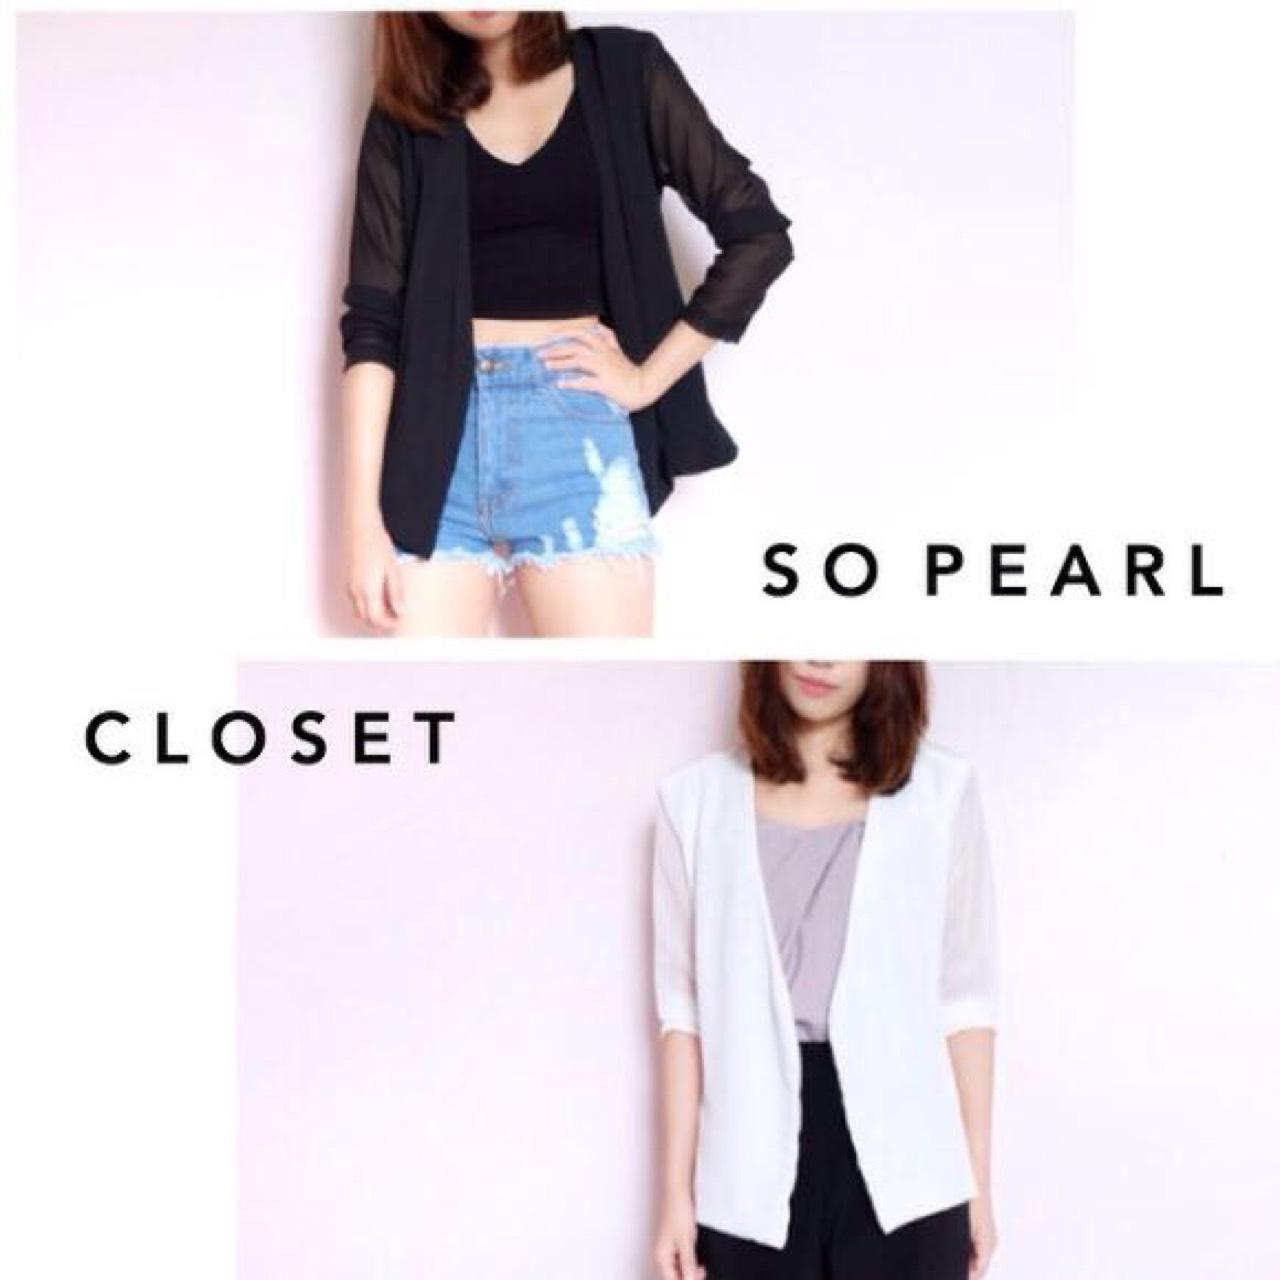 SoPearlCloset,SPcasualblazer,ผู้หญิง,women,เสื้อคลุม,เสื้อคลุมแขนยาว,เสื้อคลุมสีขาว